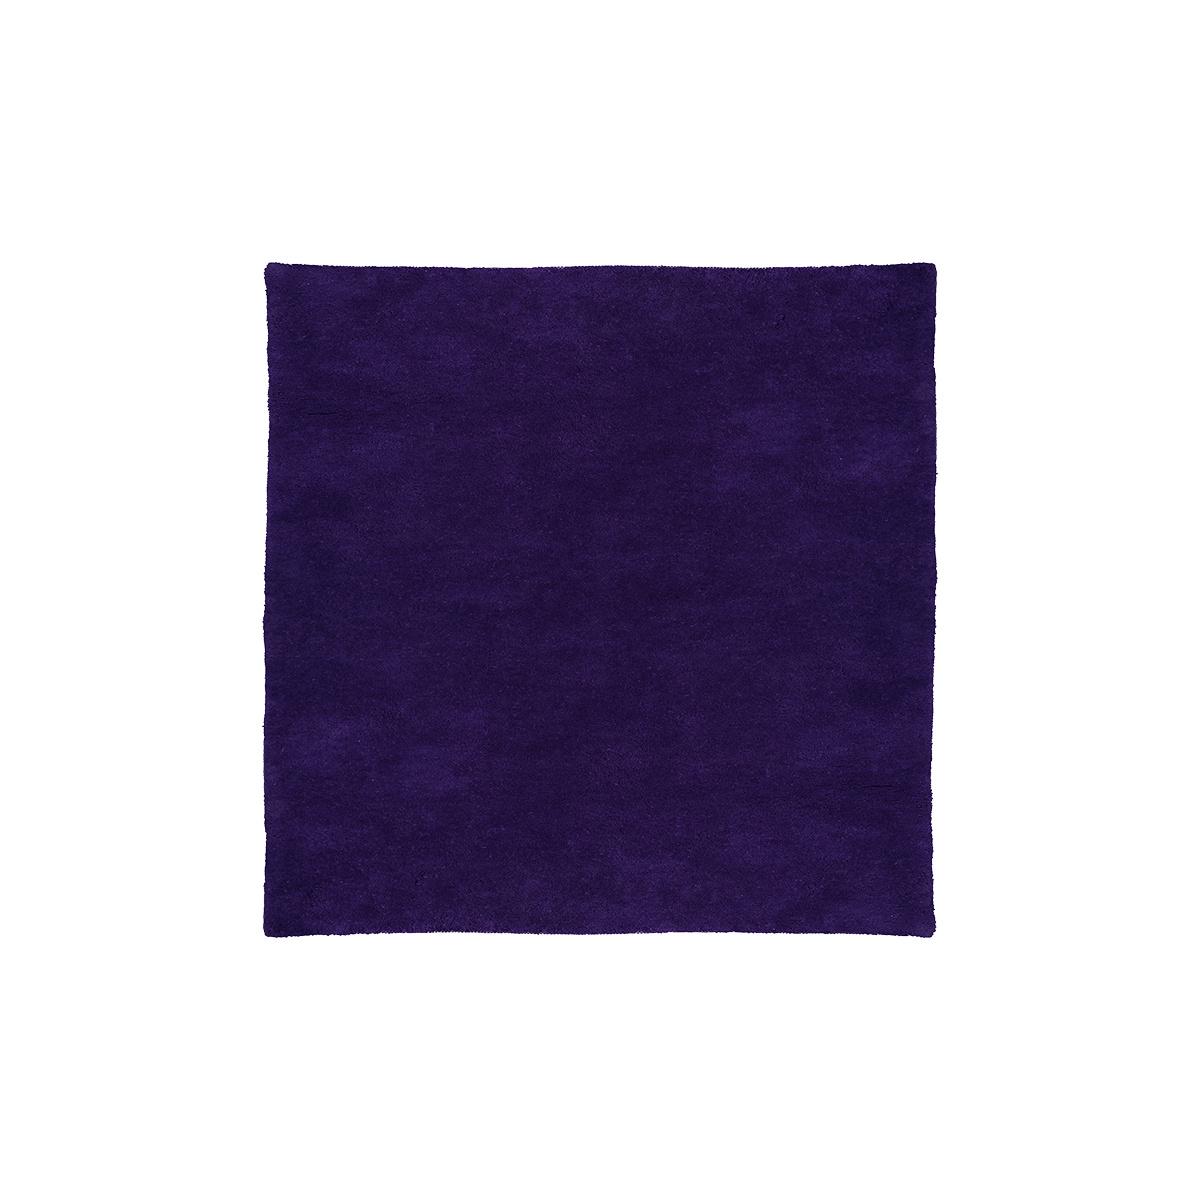 Velluto Rug, Purple 200 x 200